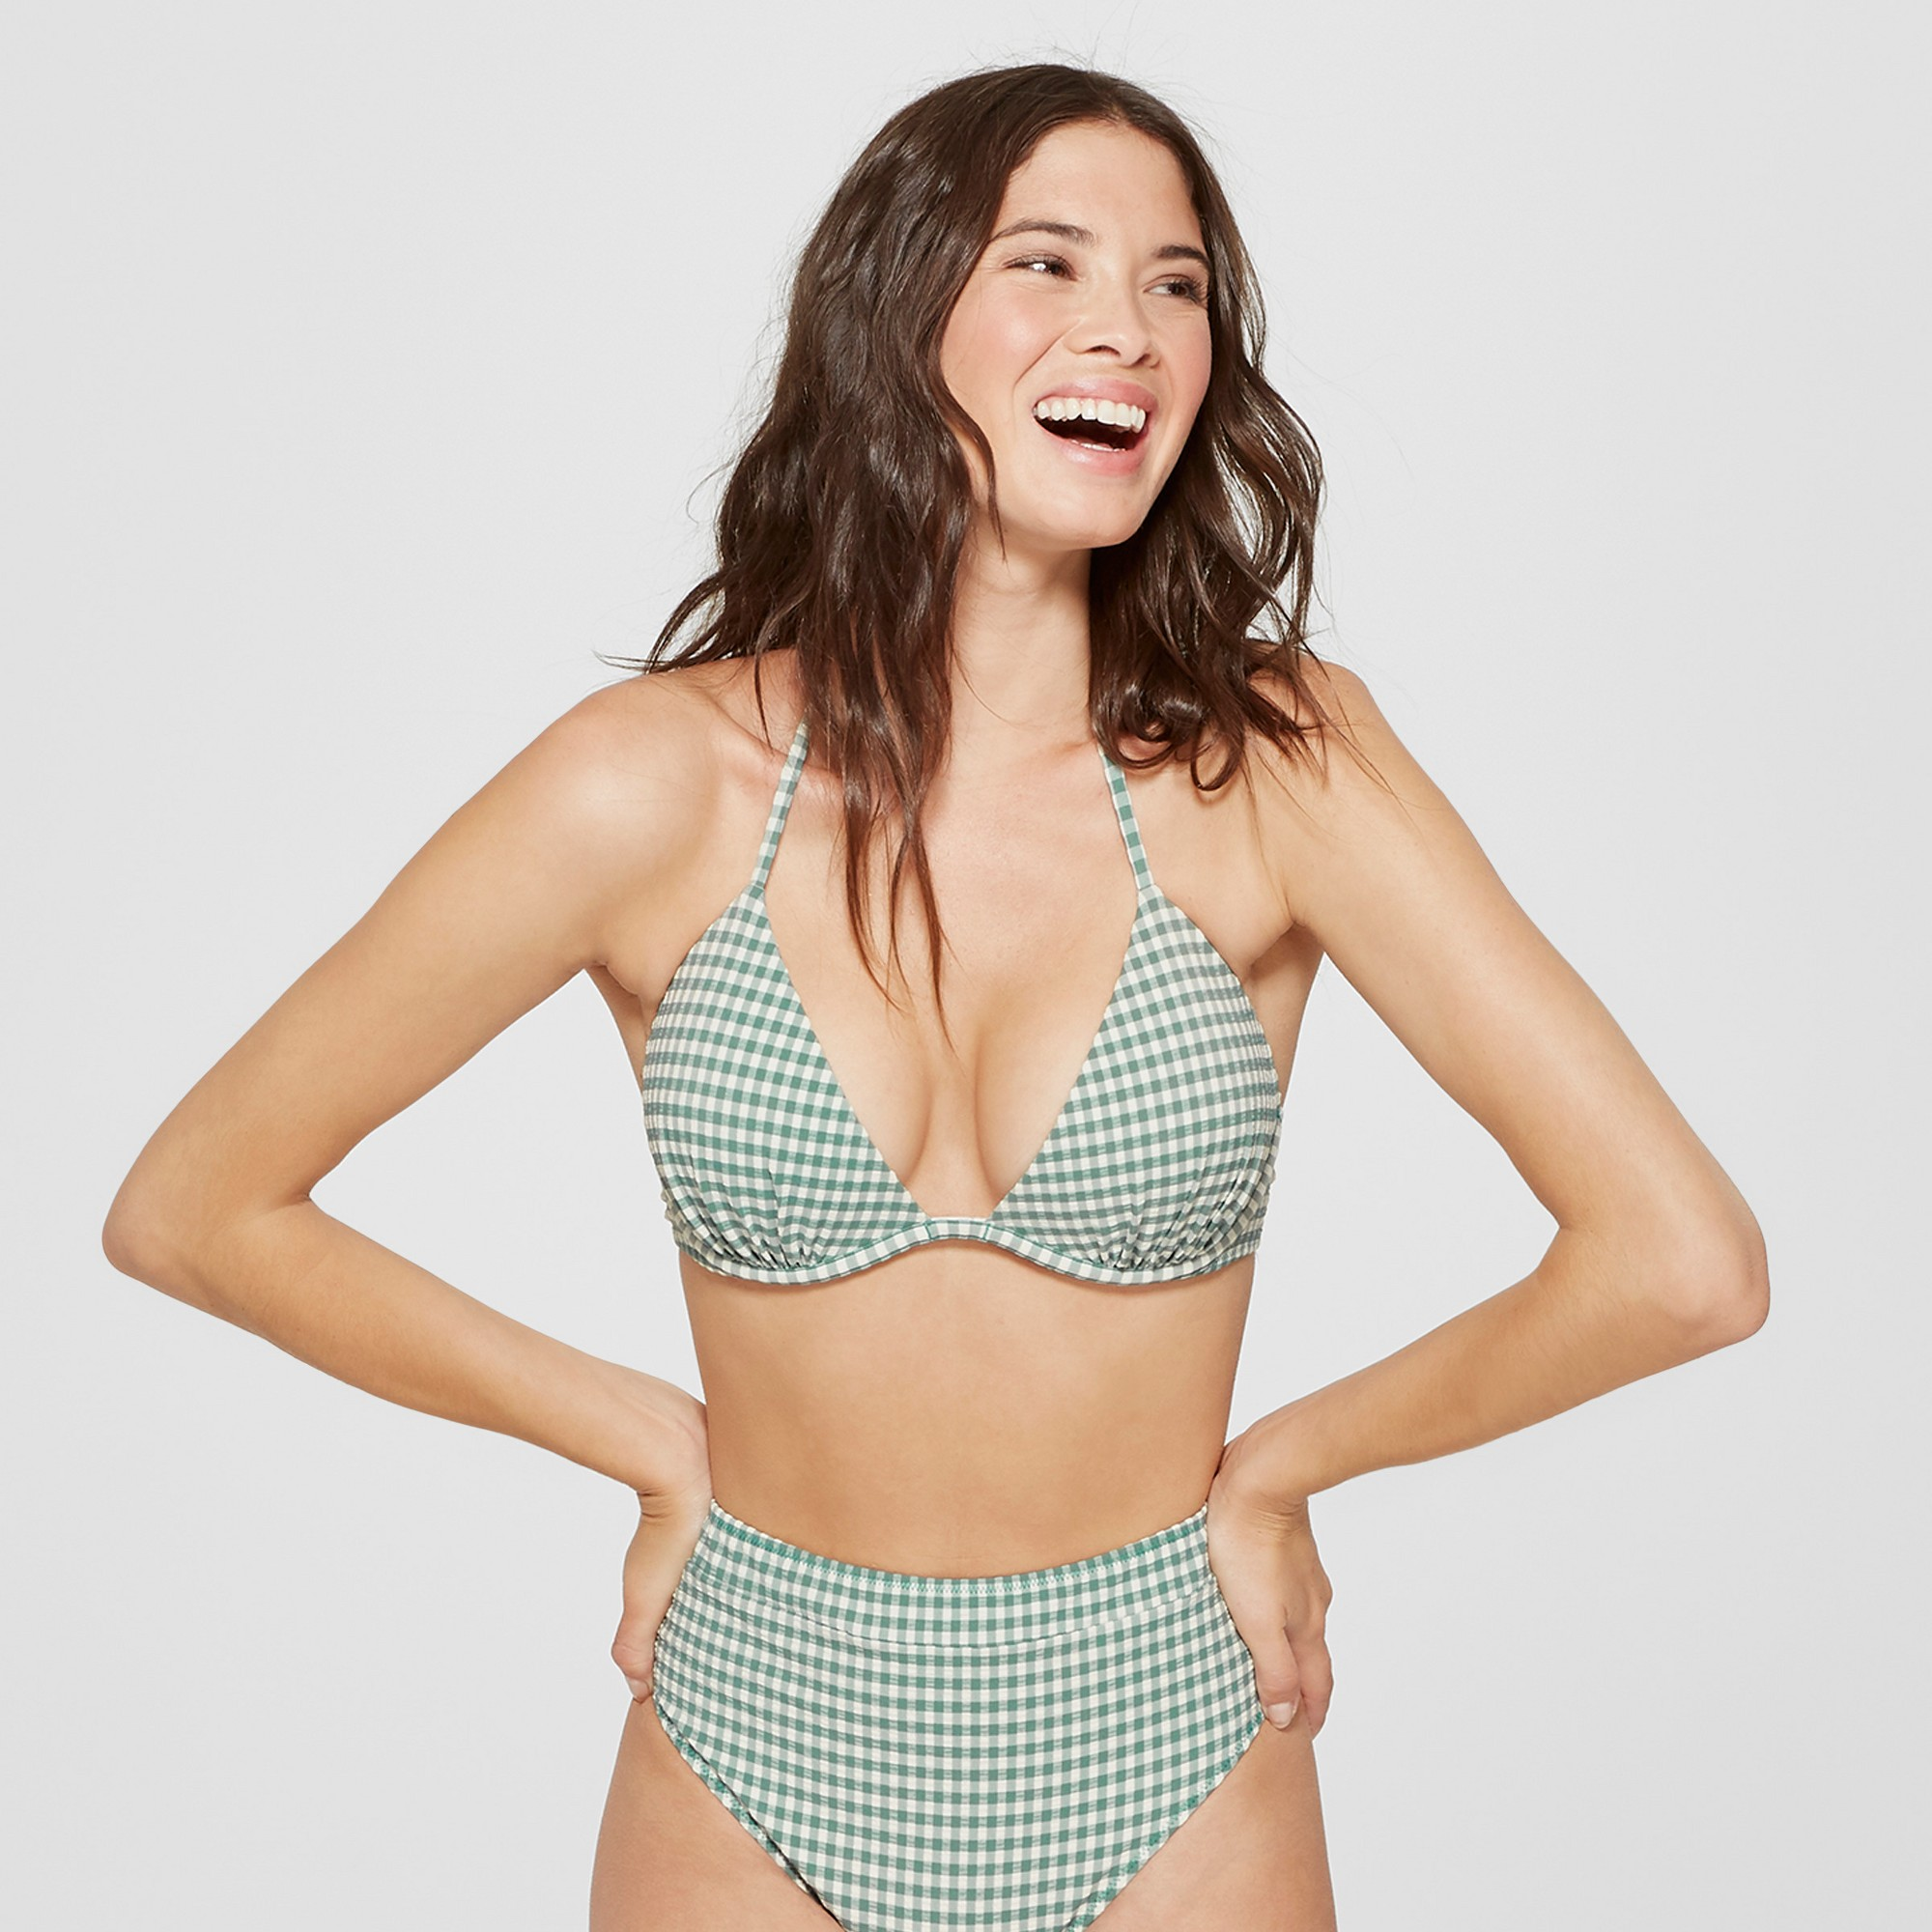 70c0254b75 Women s Tropics Push Up Triangle Seersucker Bikini Top - Shade   Shore Sage  Gingham 32DD